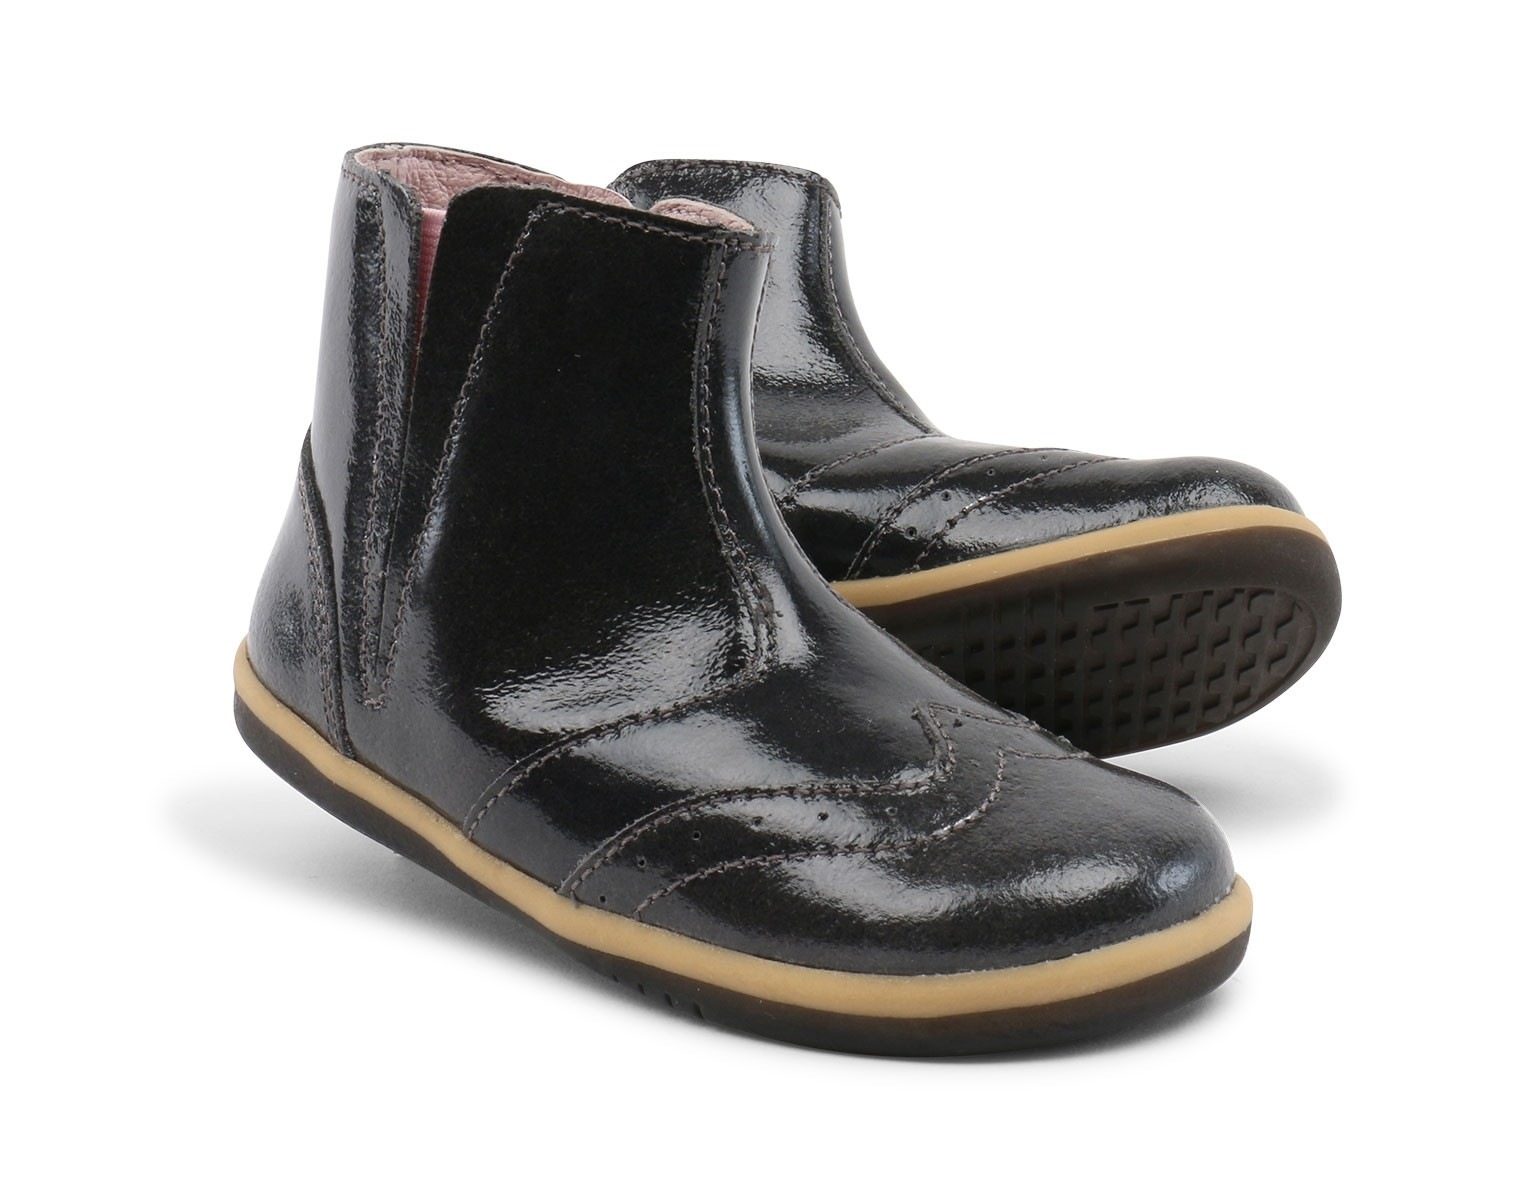 Chaussures I Walk Walk I Gloss Charcol gloss 628305 SeBio cdce4a